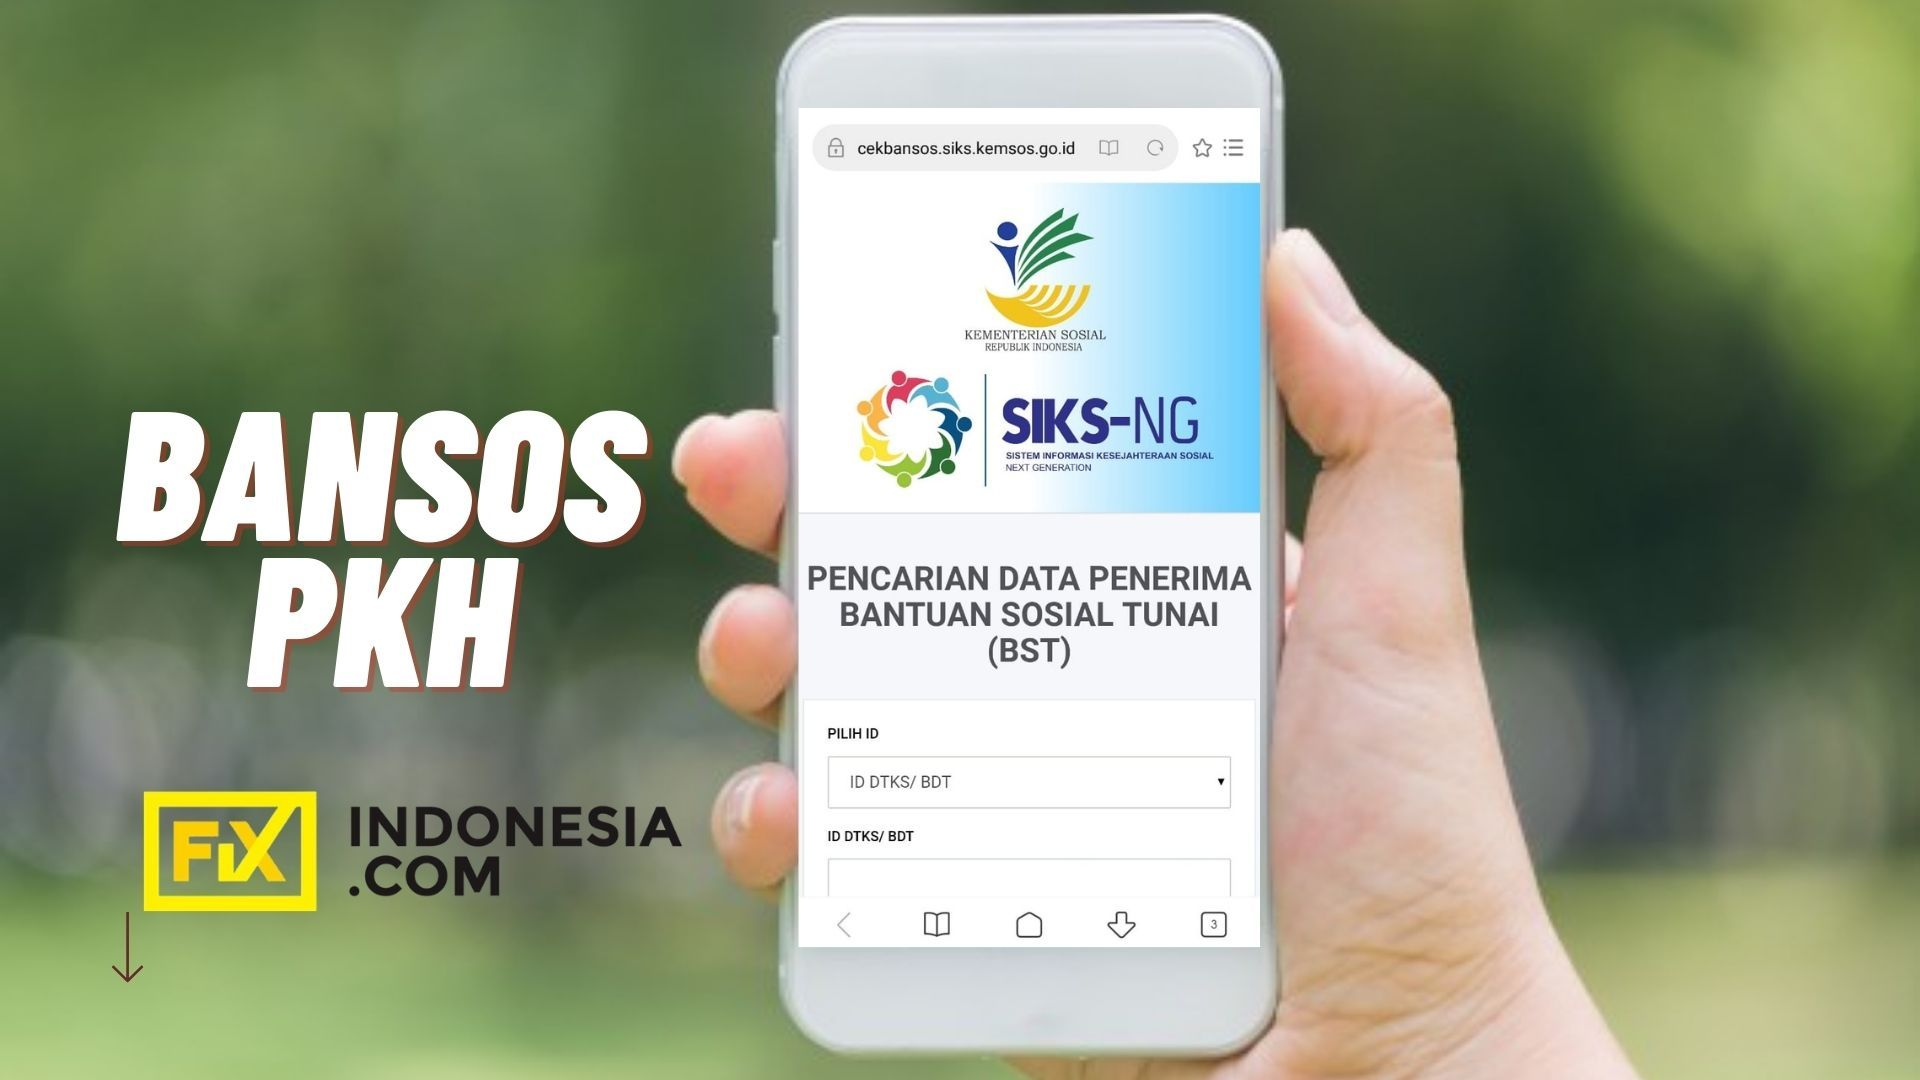 (Fix Indonesia)